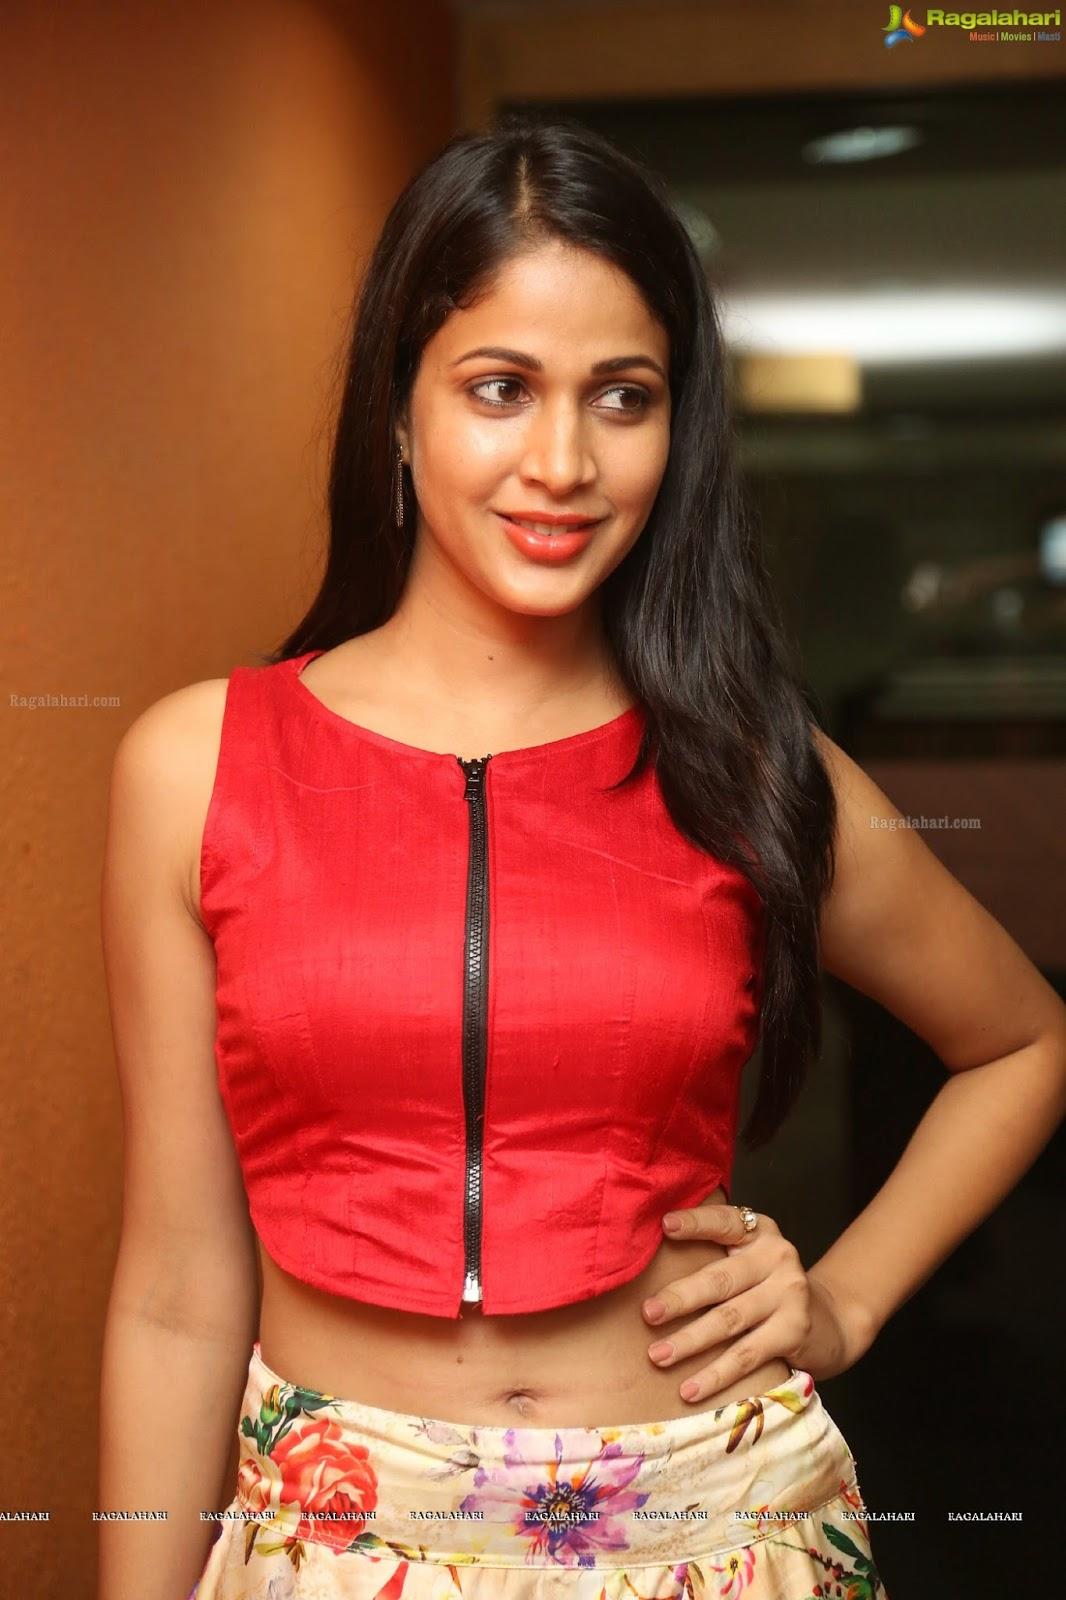 Telugu Actress Madhurima Latest Hot & Spicy Photo Stills